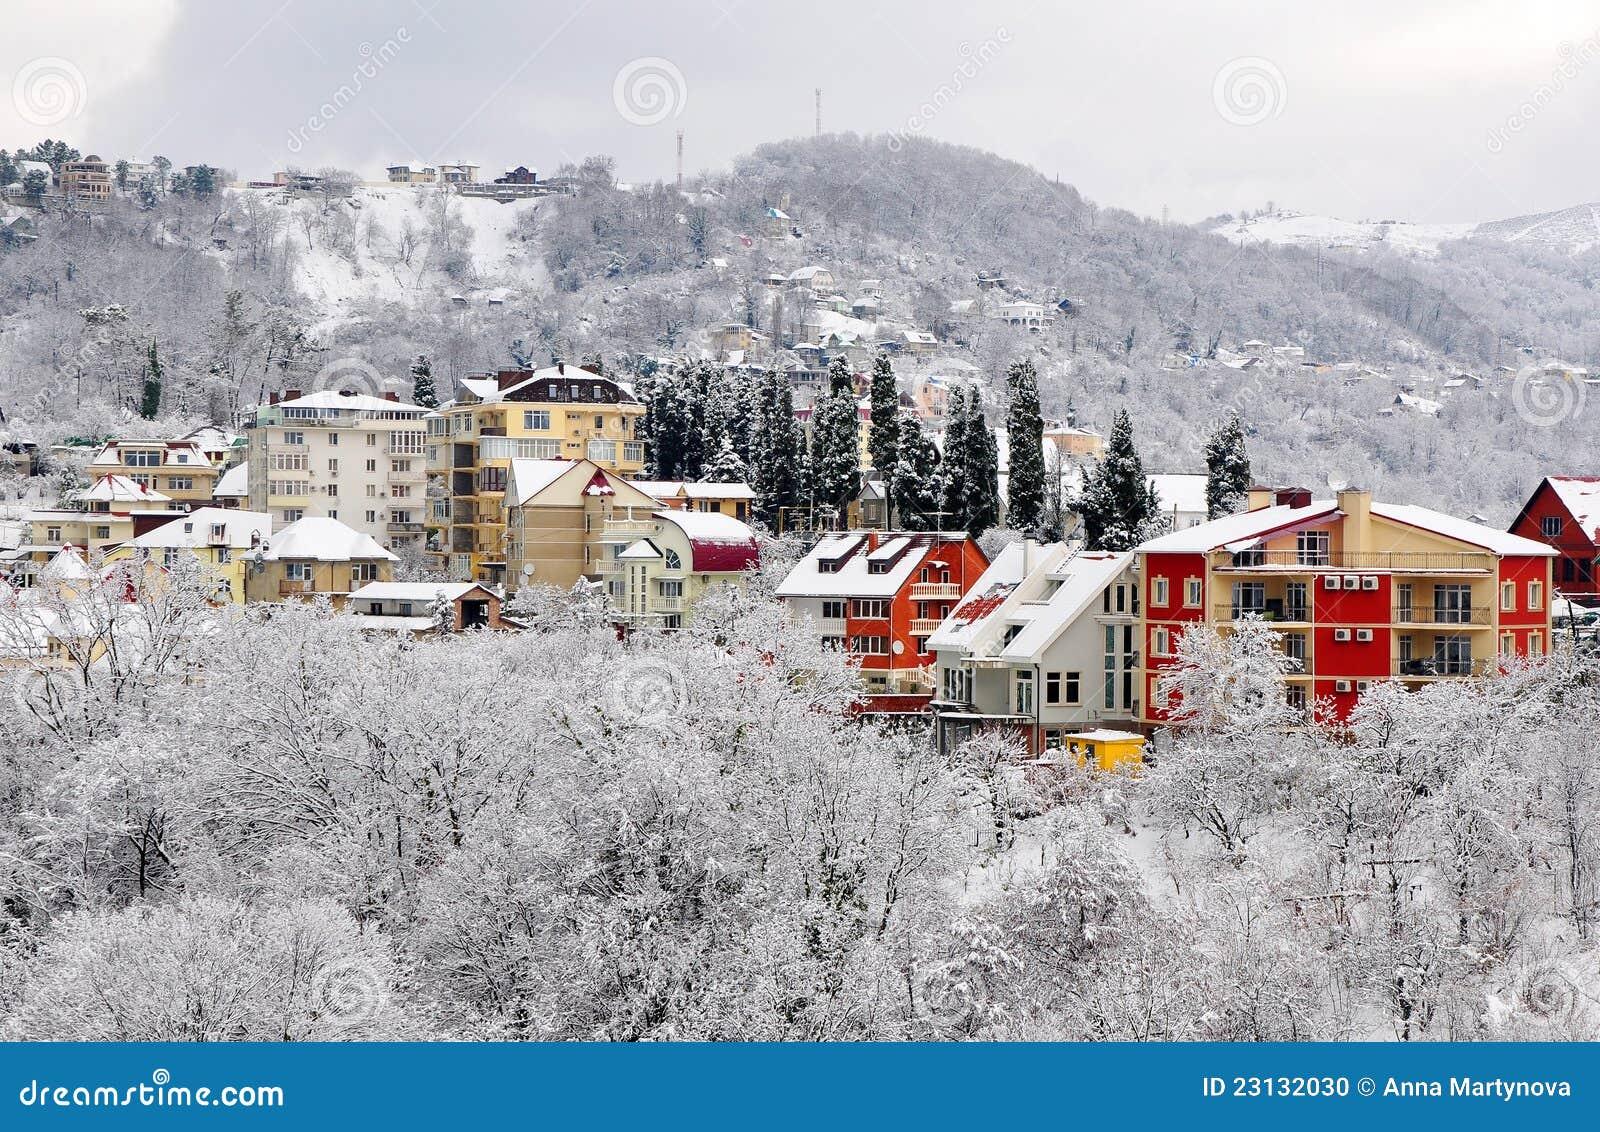 Winter landscape of Sochi